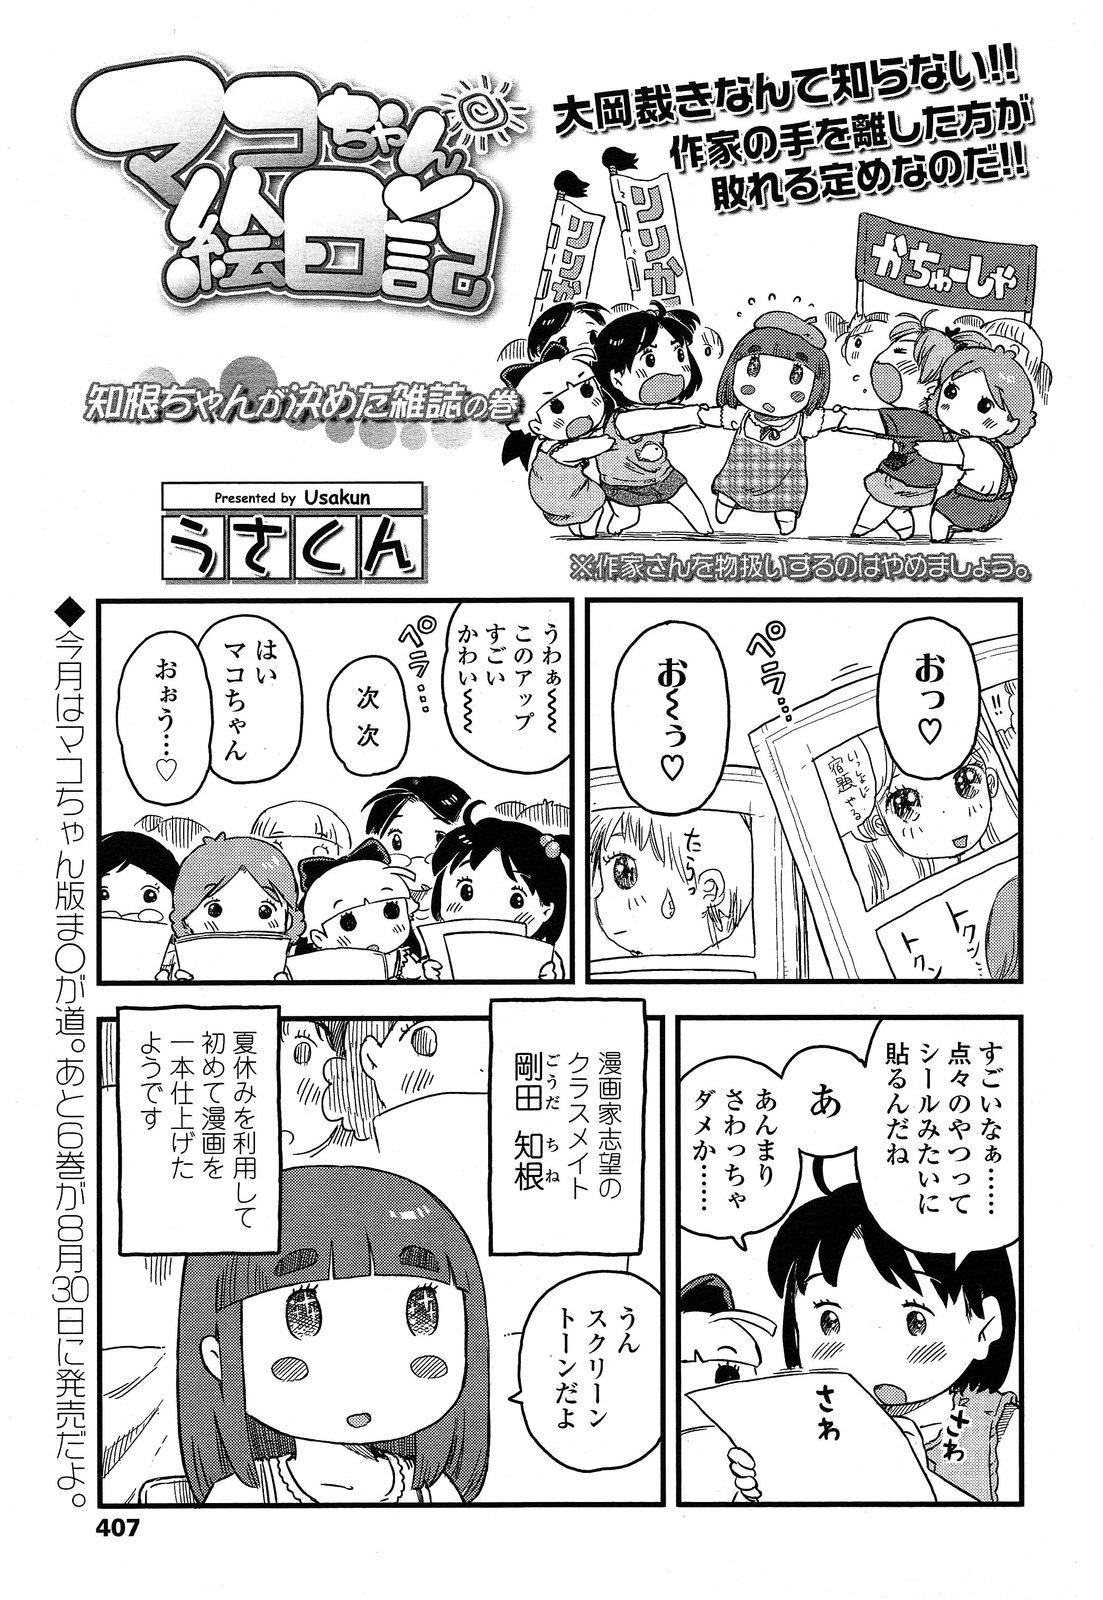 Comic LO 2013-10 Vol. 115 406